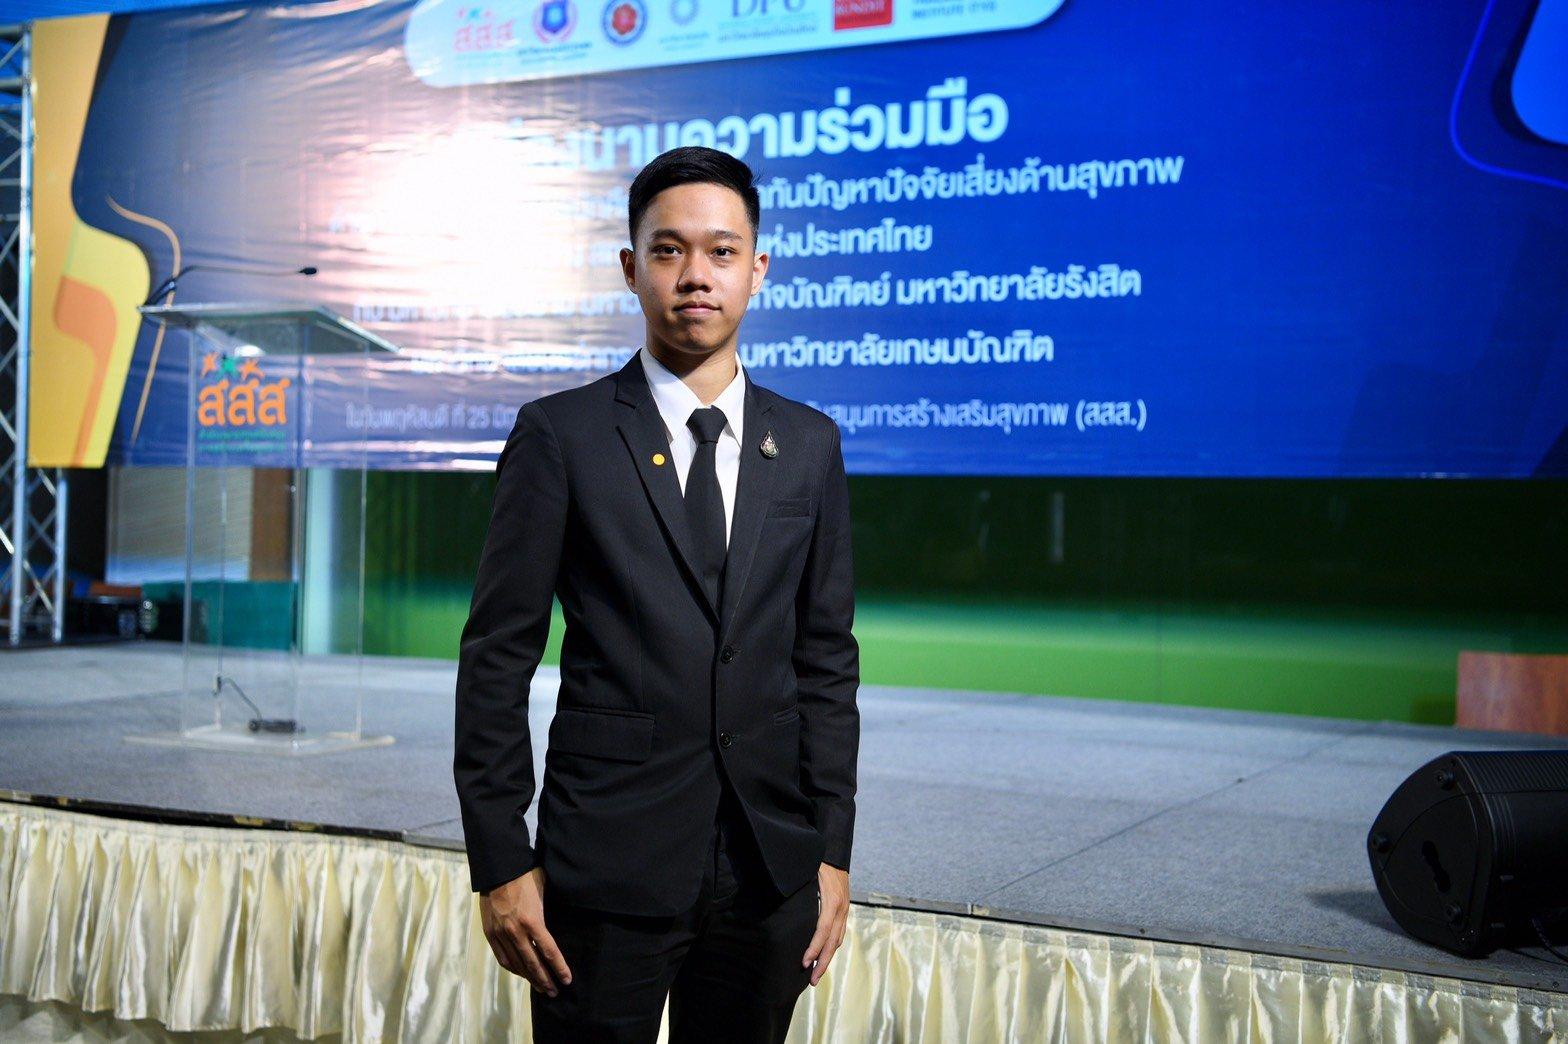 MOU 5 ม.เอกชนชื่อดัง ลดปัจจัยเสี่ยงทางสุขภาพกลุ่มนักศึกษา thaihealth